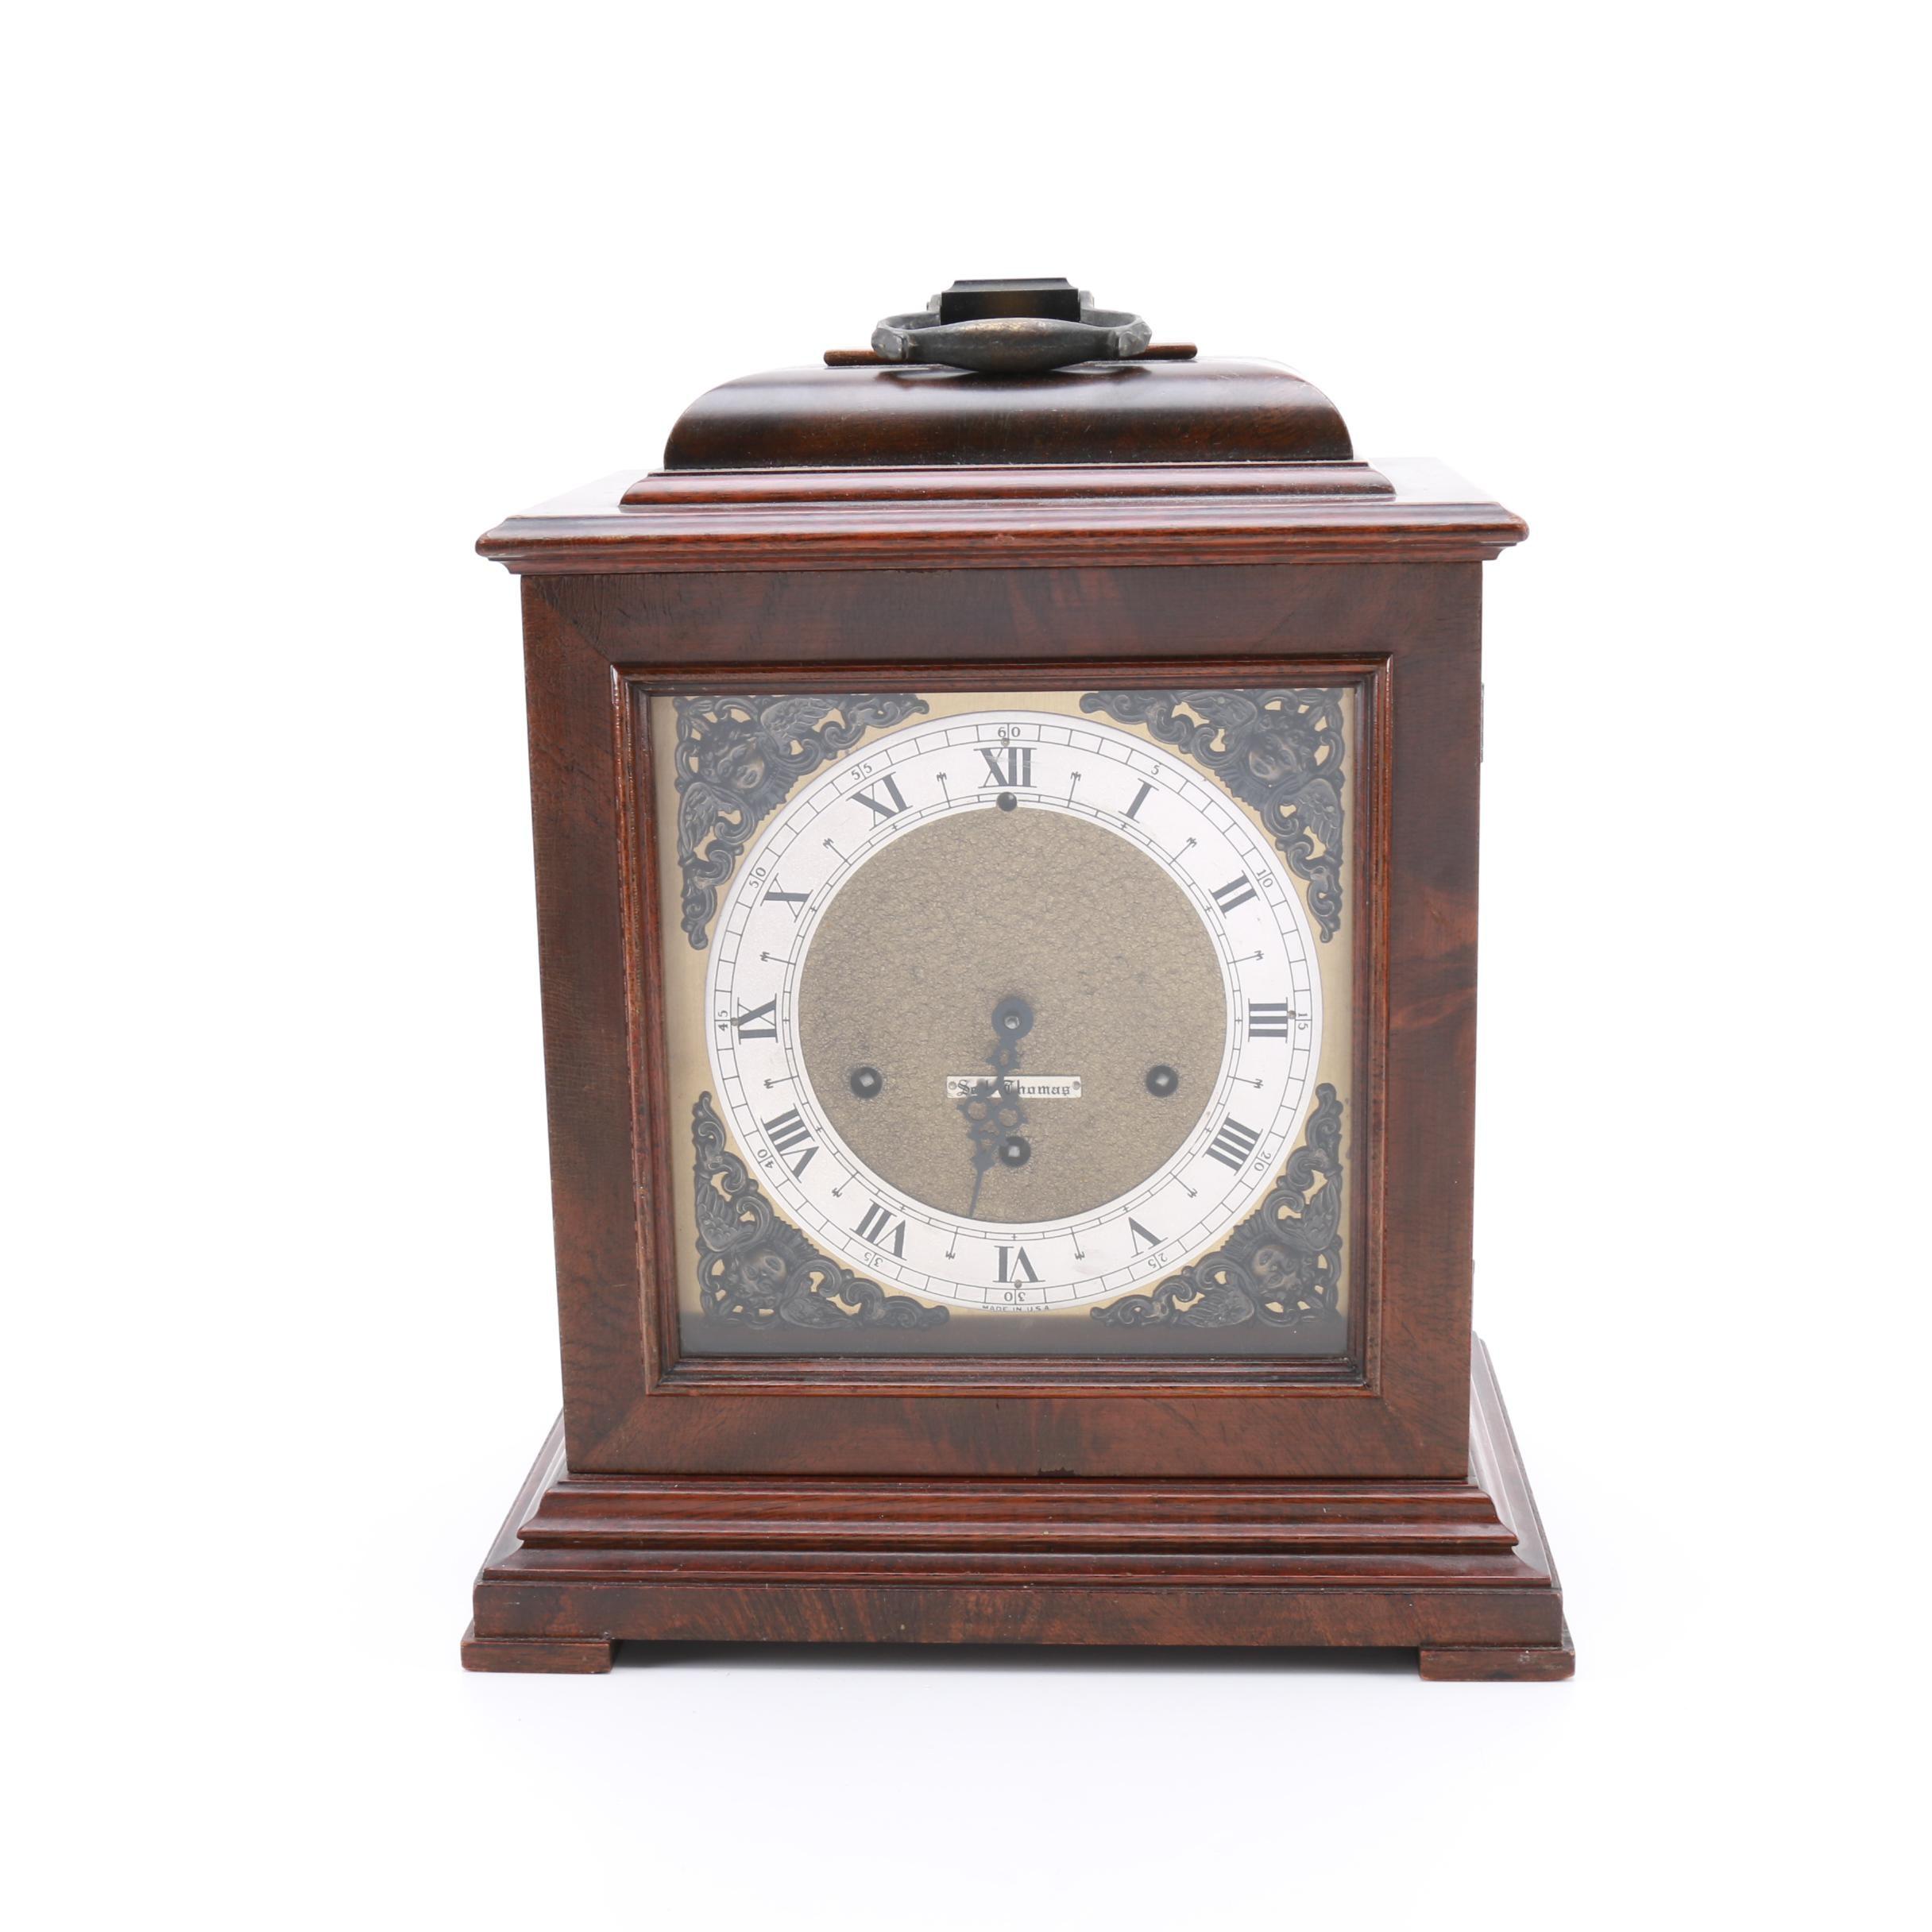 1949 Seth Thomas Westminster Chime Mantel Clock